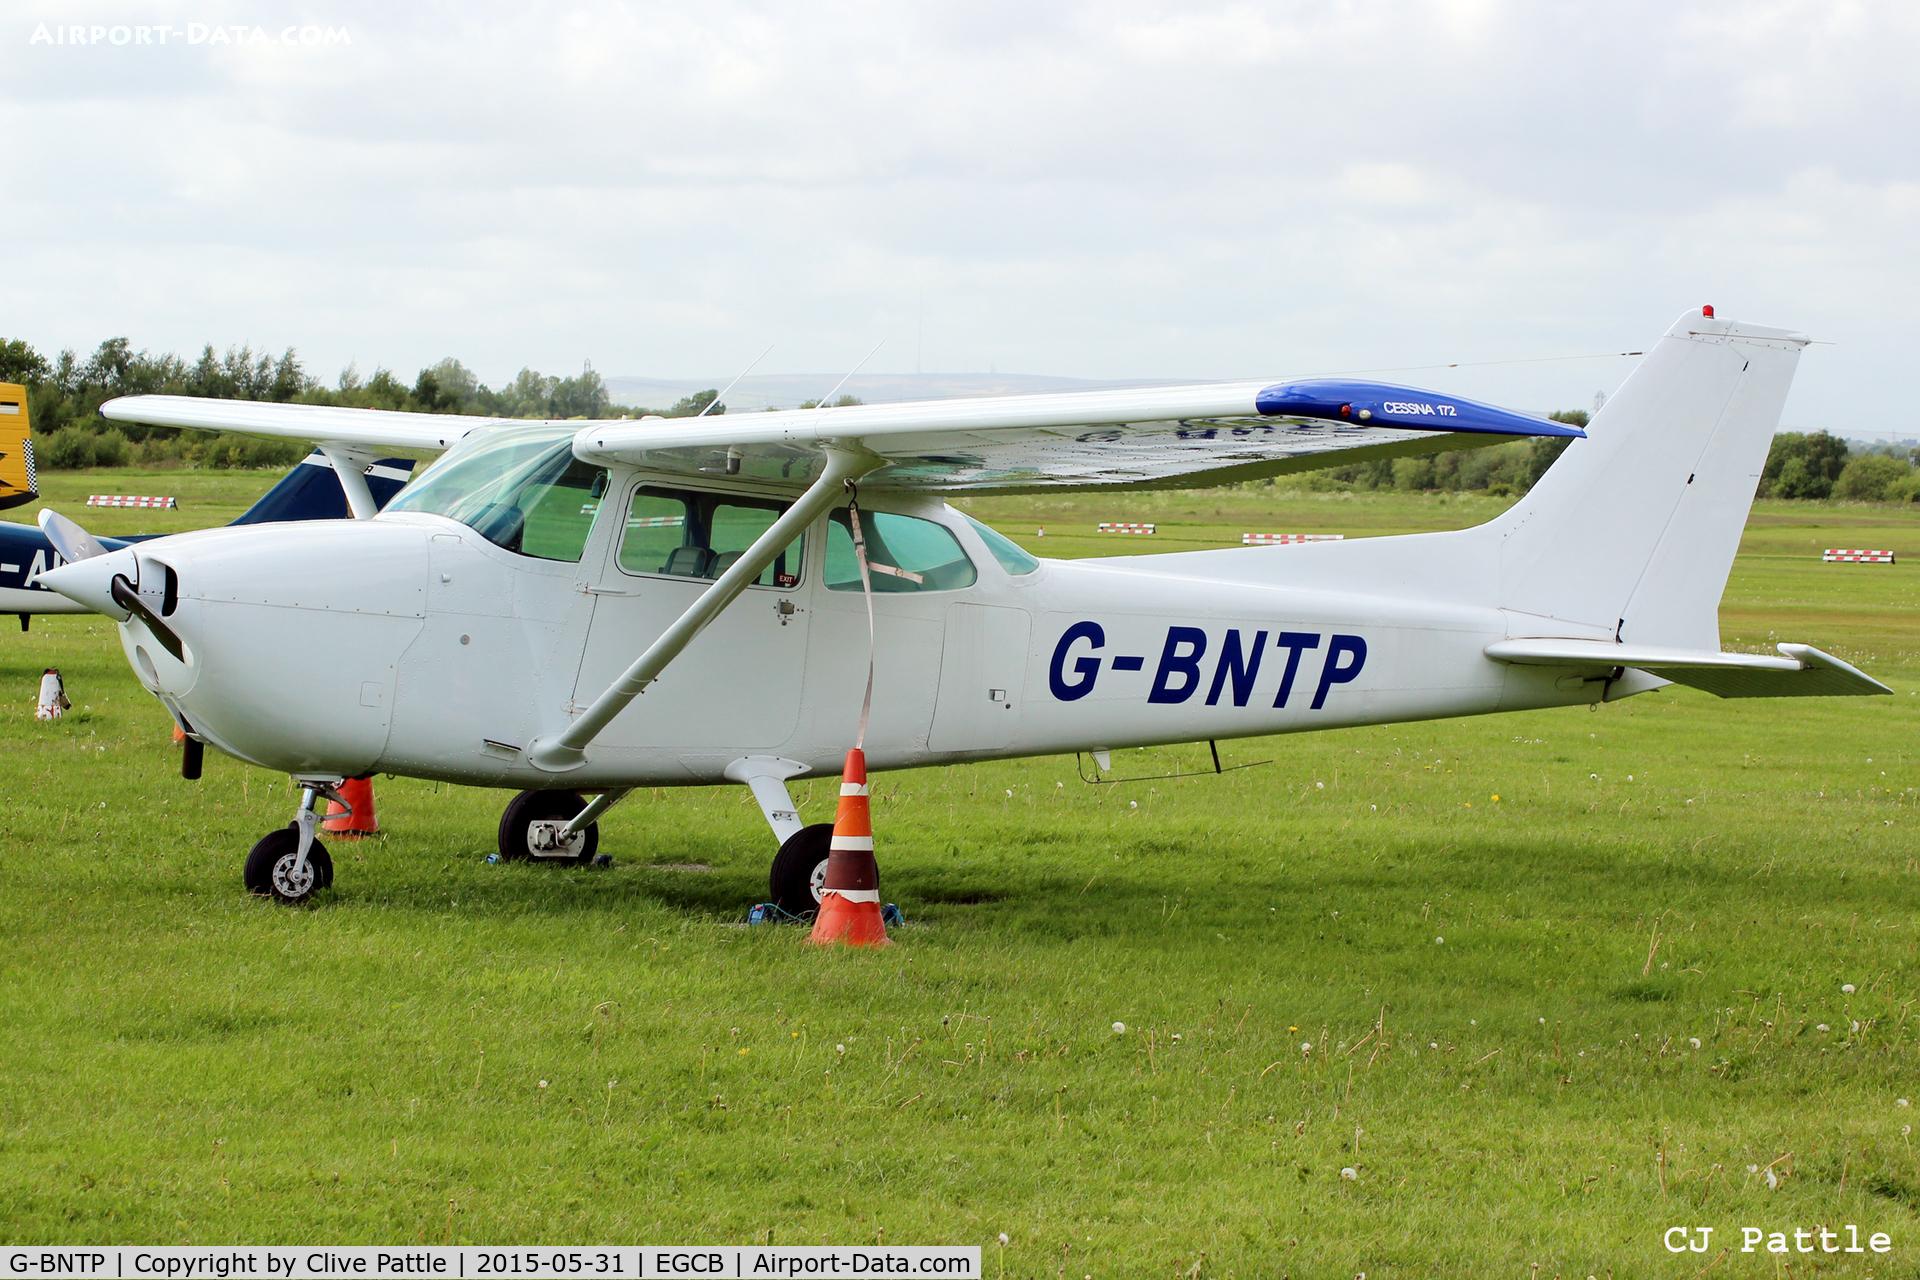 G-BNTP, 1978 Cessna 172N Skyhawk C/N 172-72030, At Barton, EGCB